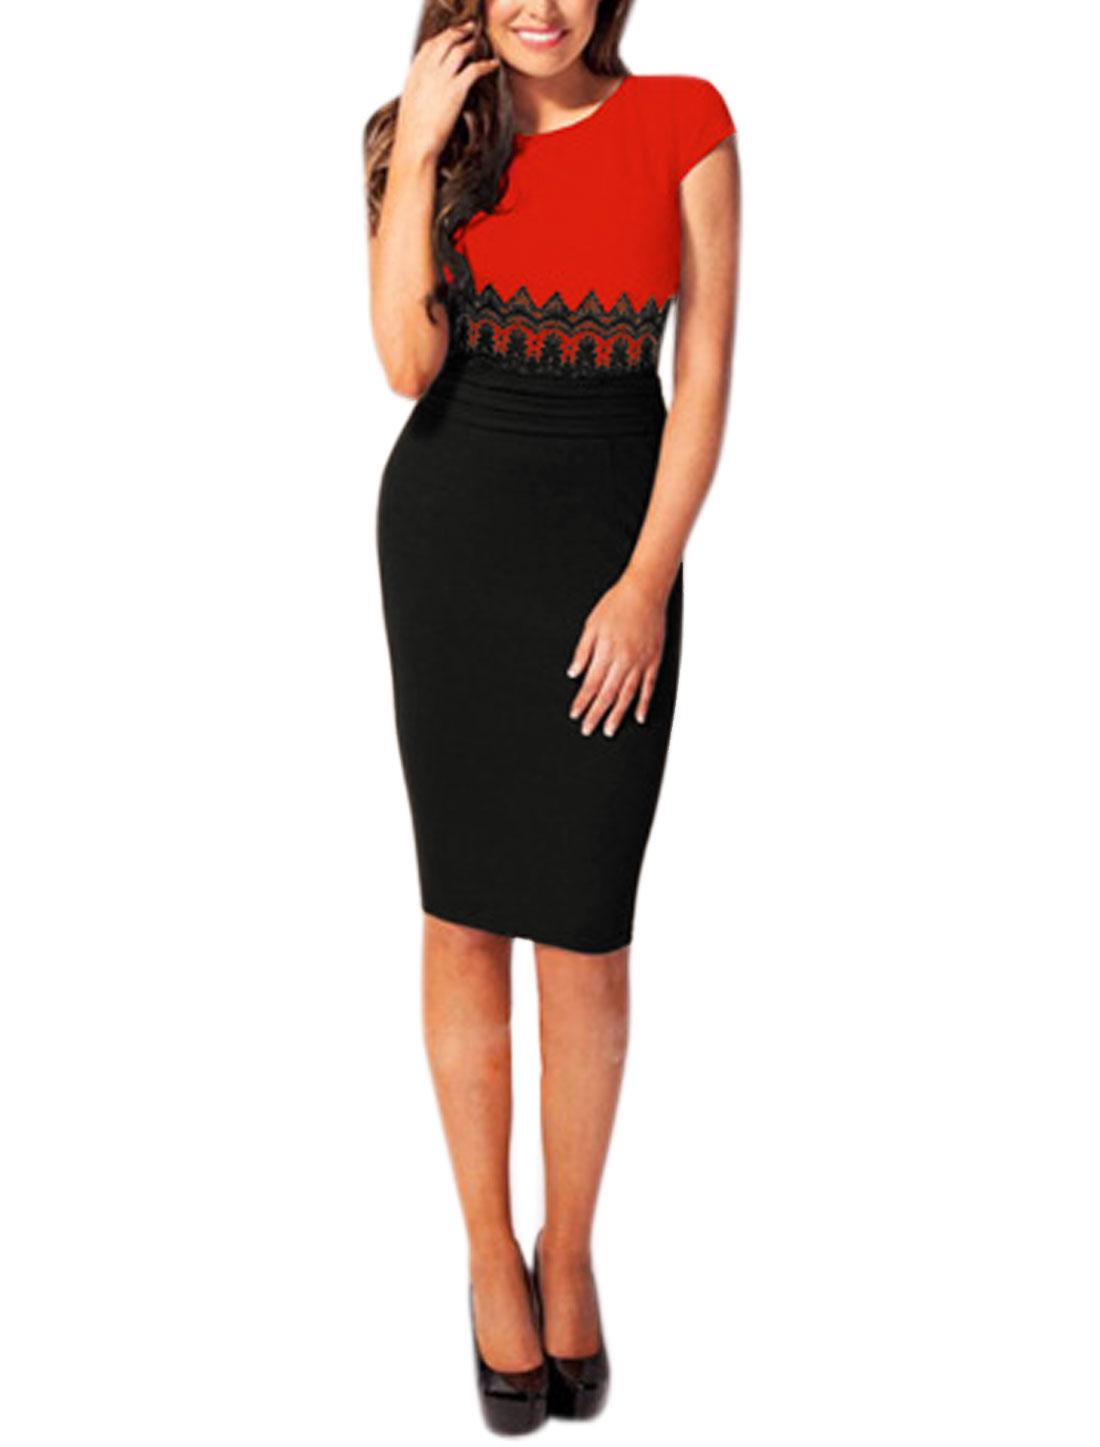 Women Panel Design Cap Sleeves Color Block Pencil Dress Red M